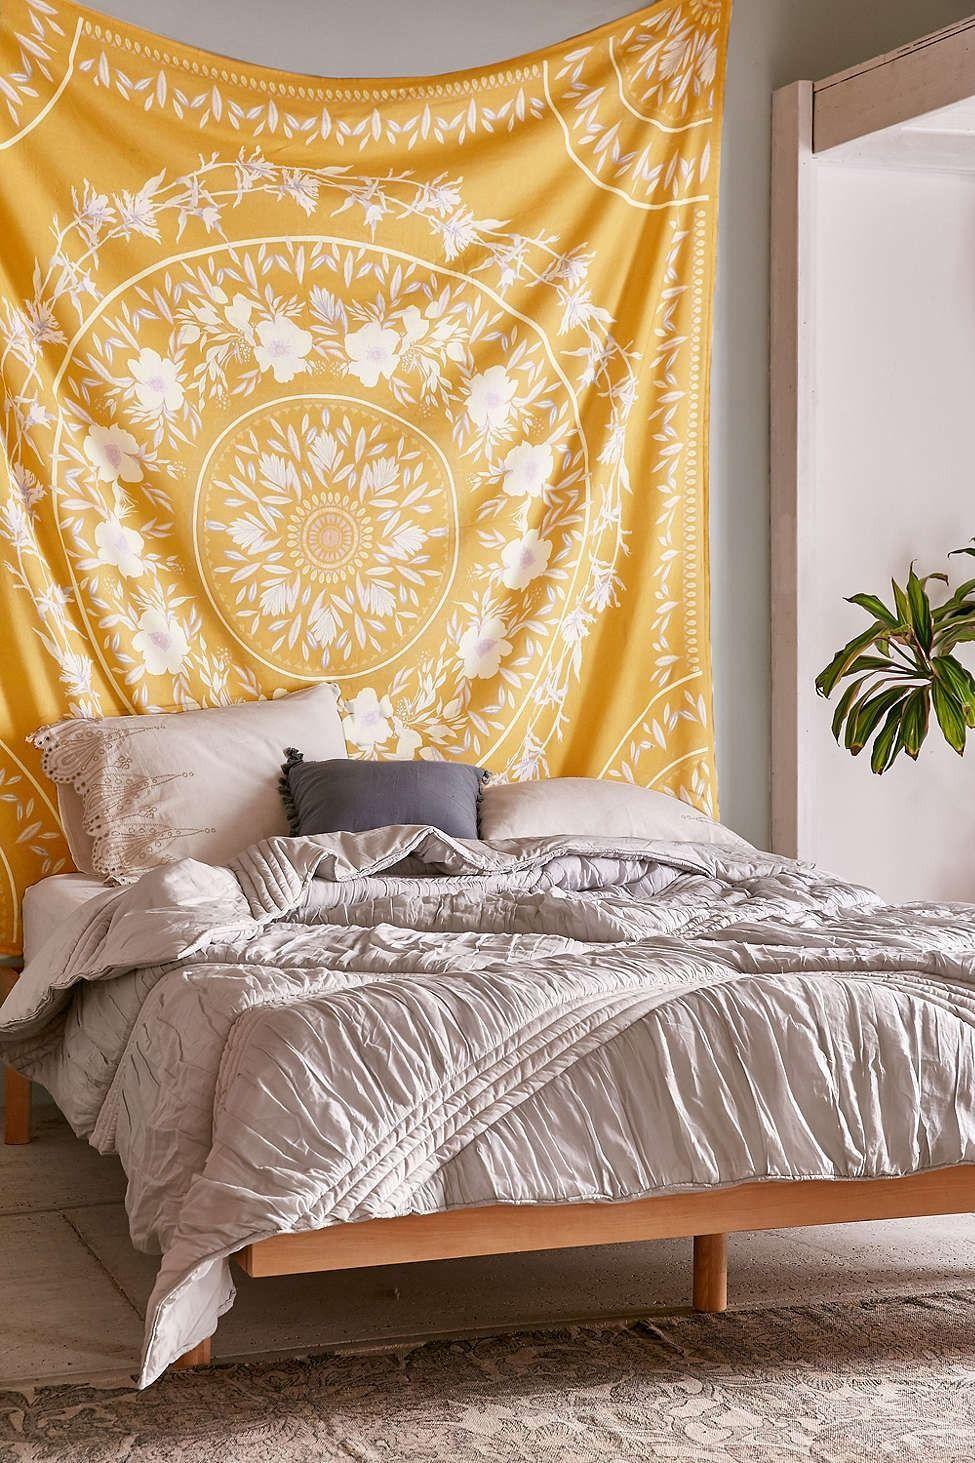 DIY Bedroom Ideas For Girls Or Boys - Furniture   Pinterest ...